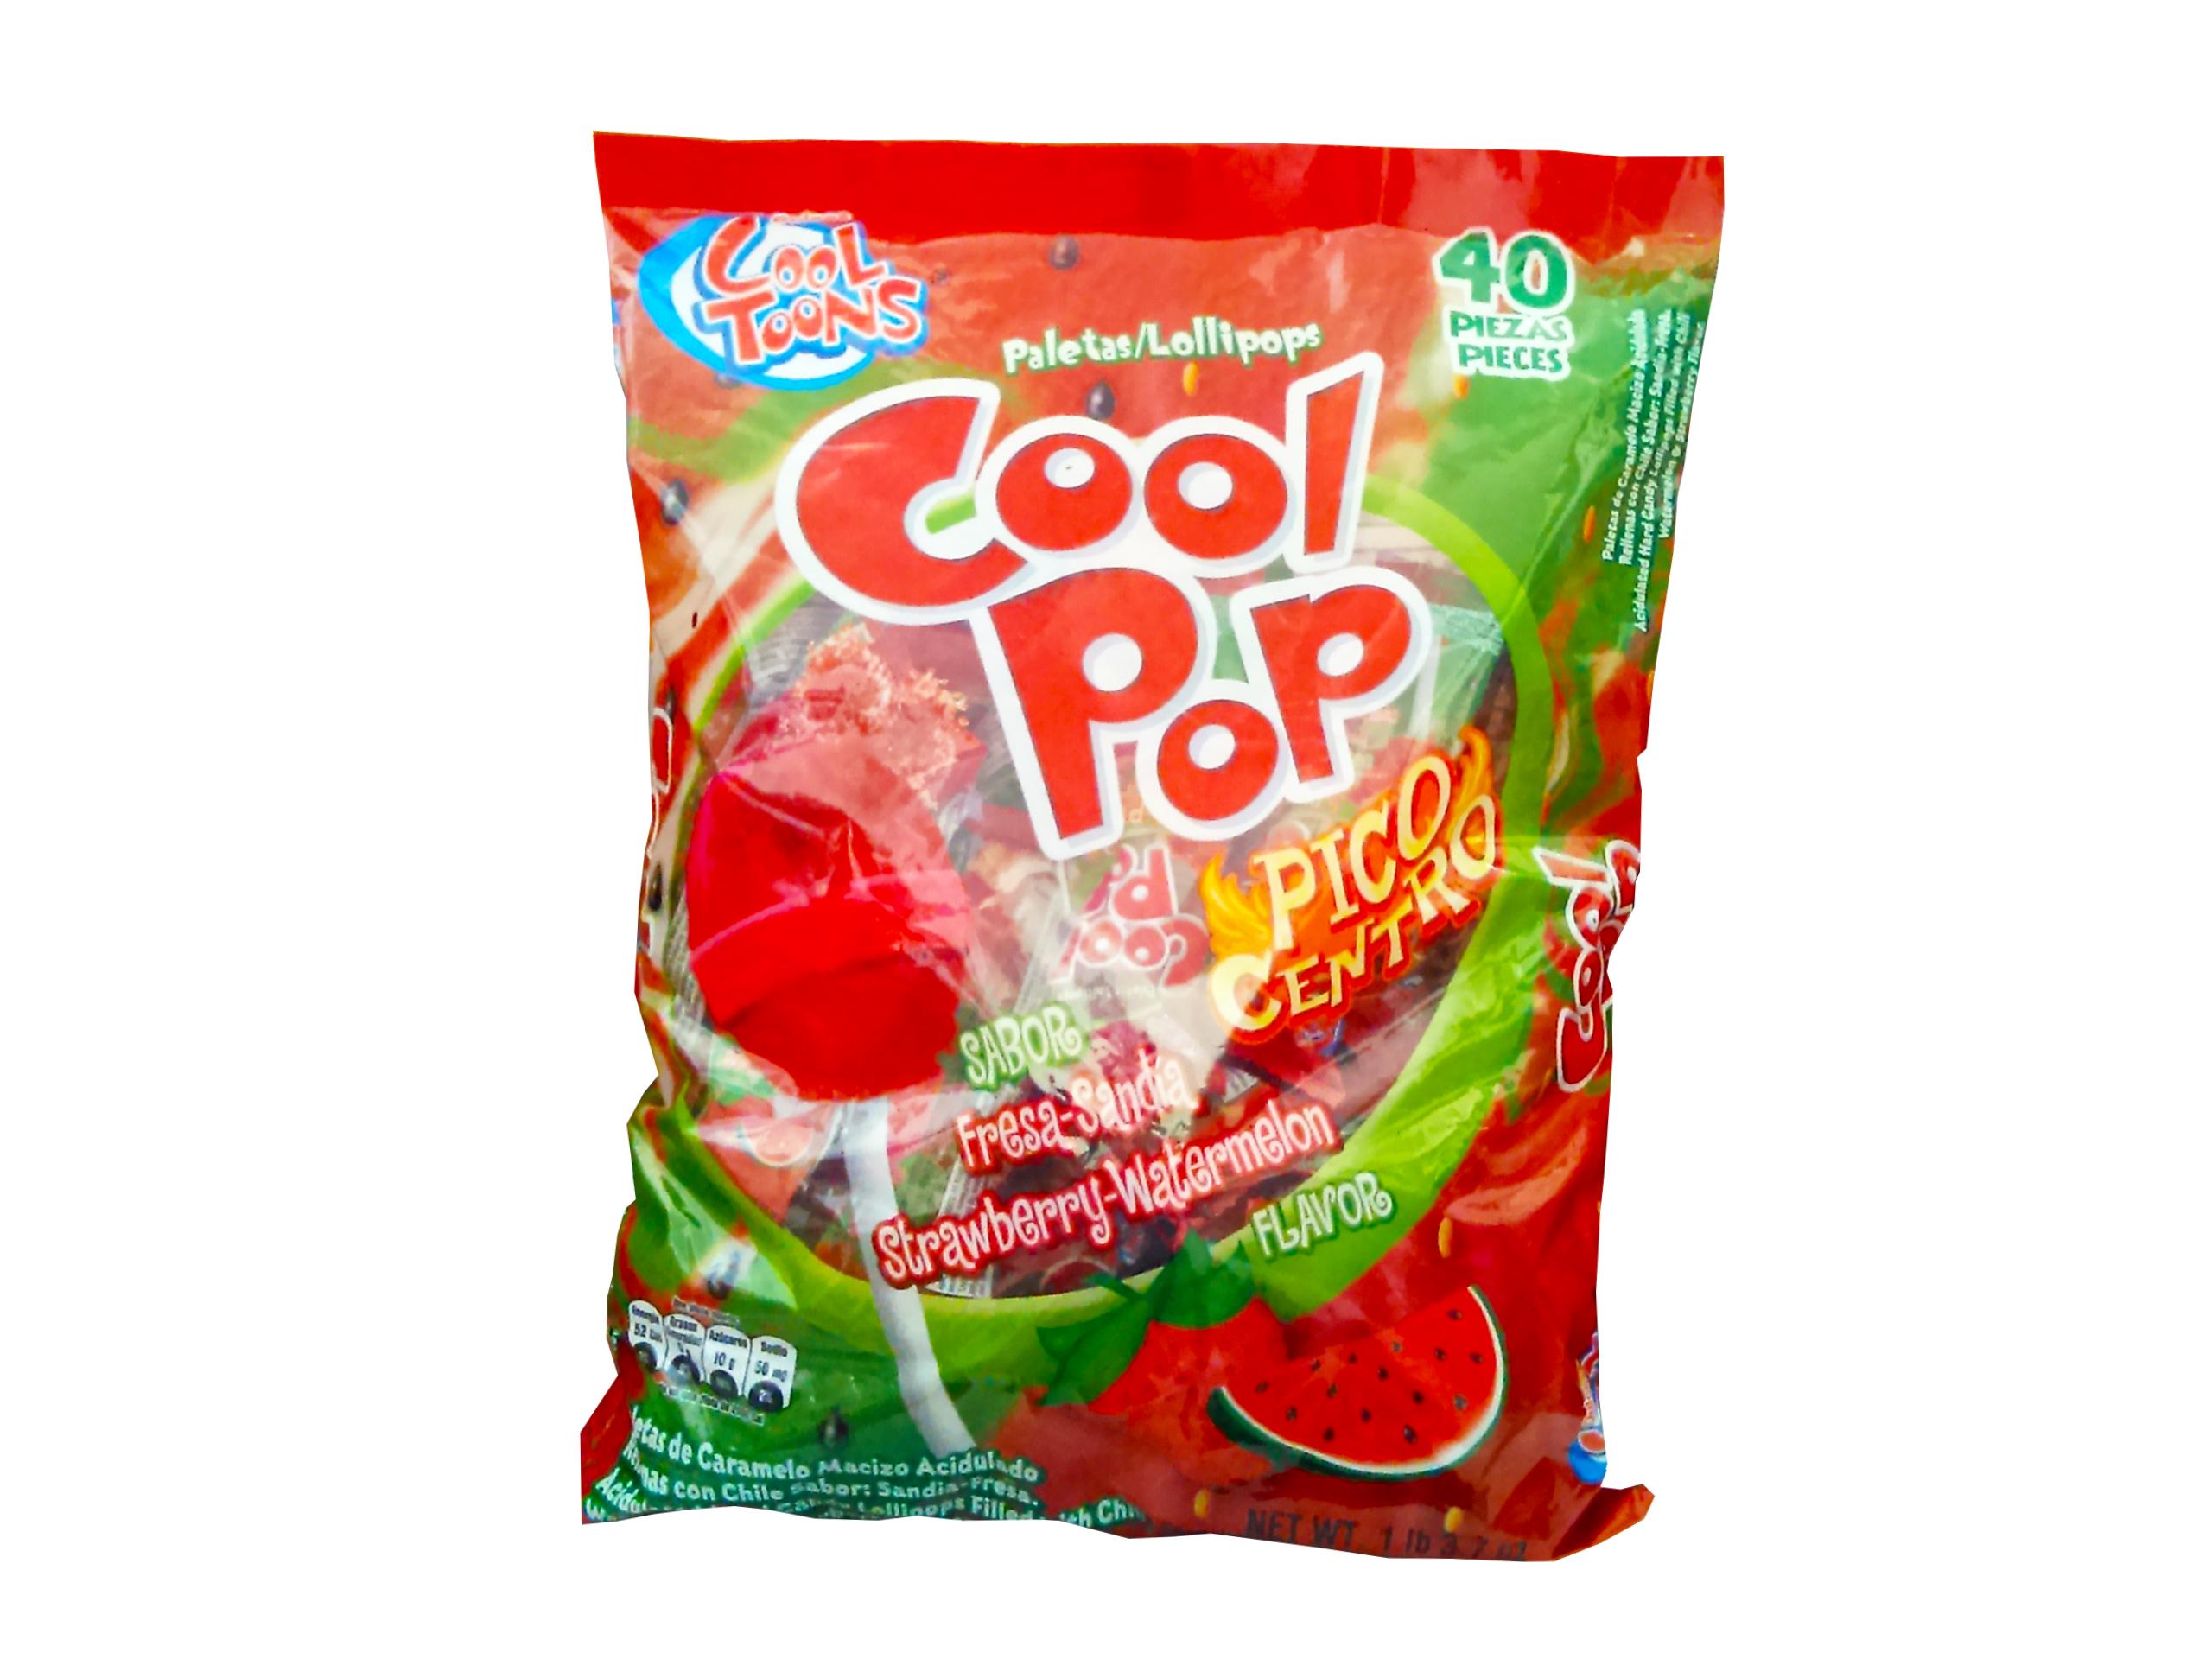 PALETA COOL POP